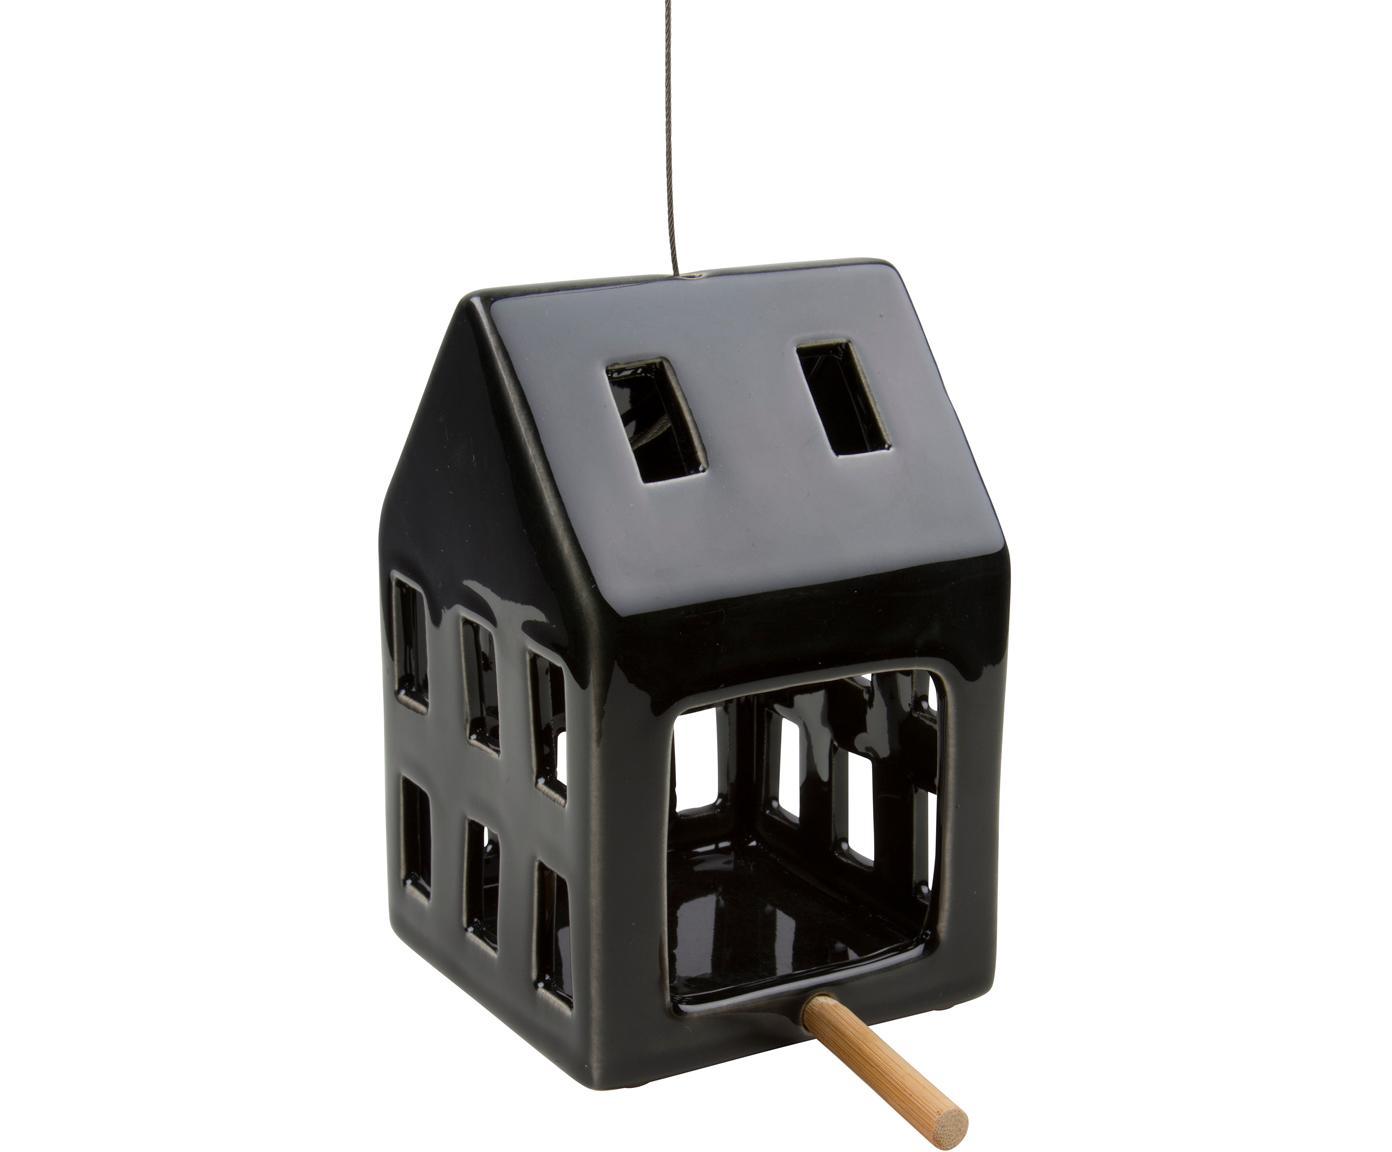 Comedero para pájaros Hemma, Cerámica, bambú, metal, Negro, An 9 x Al 14 cm